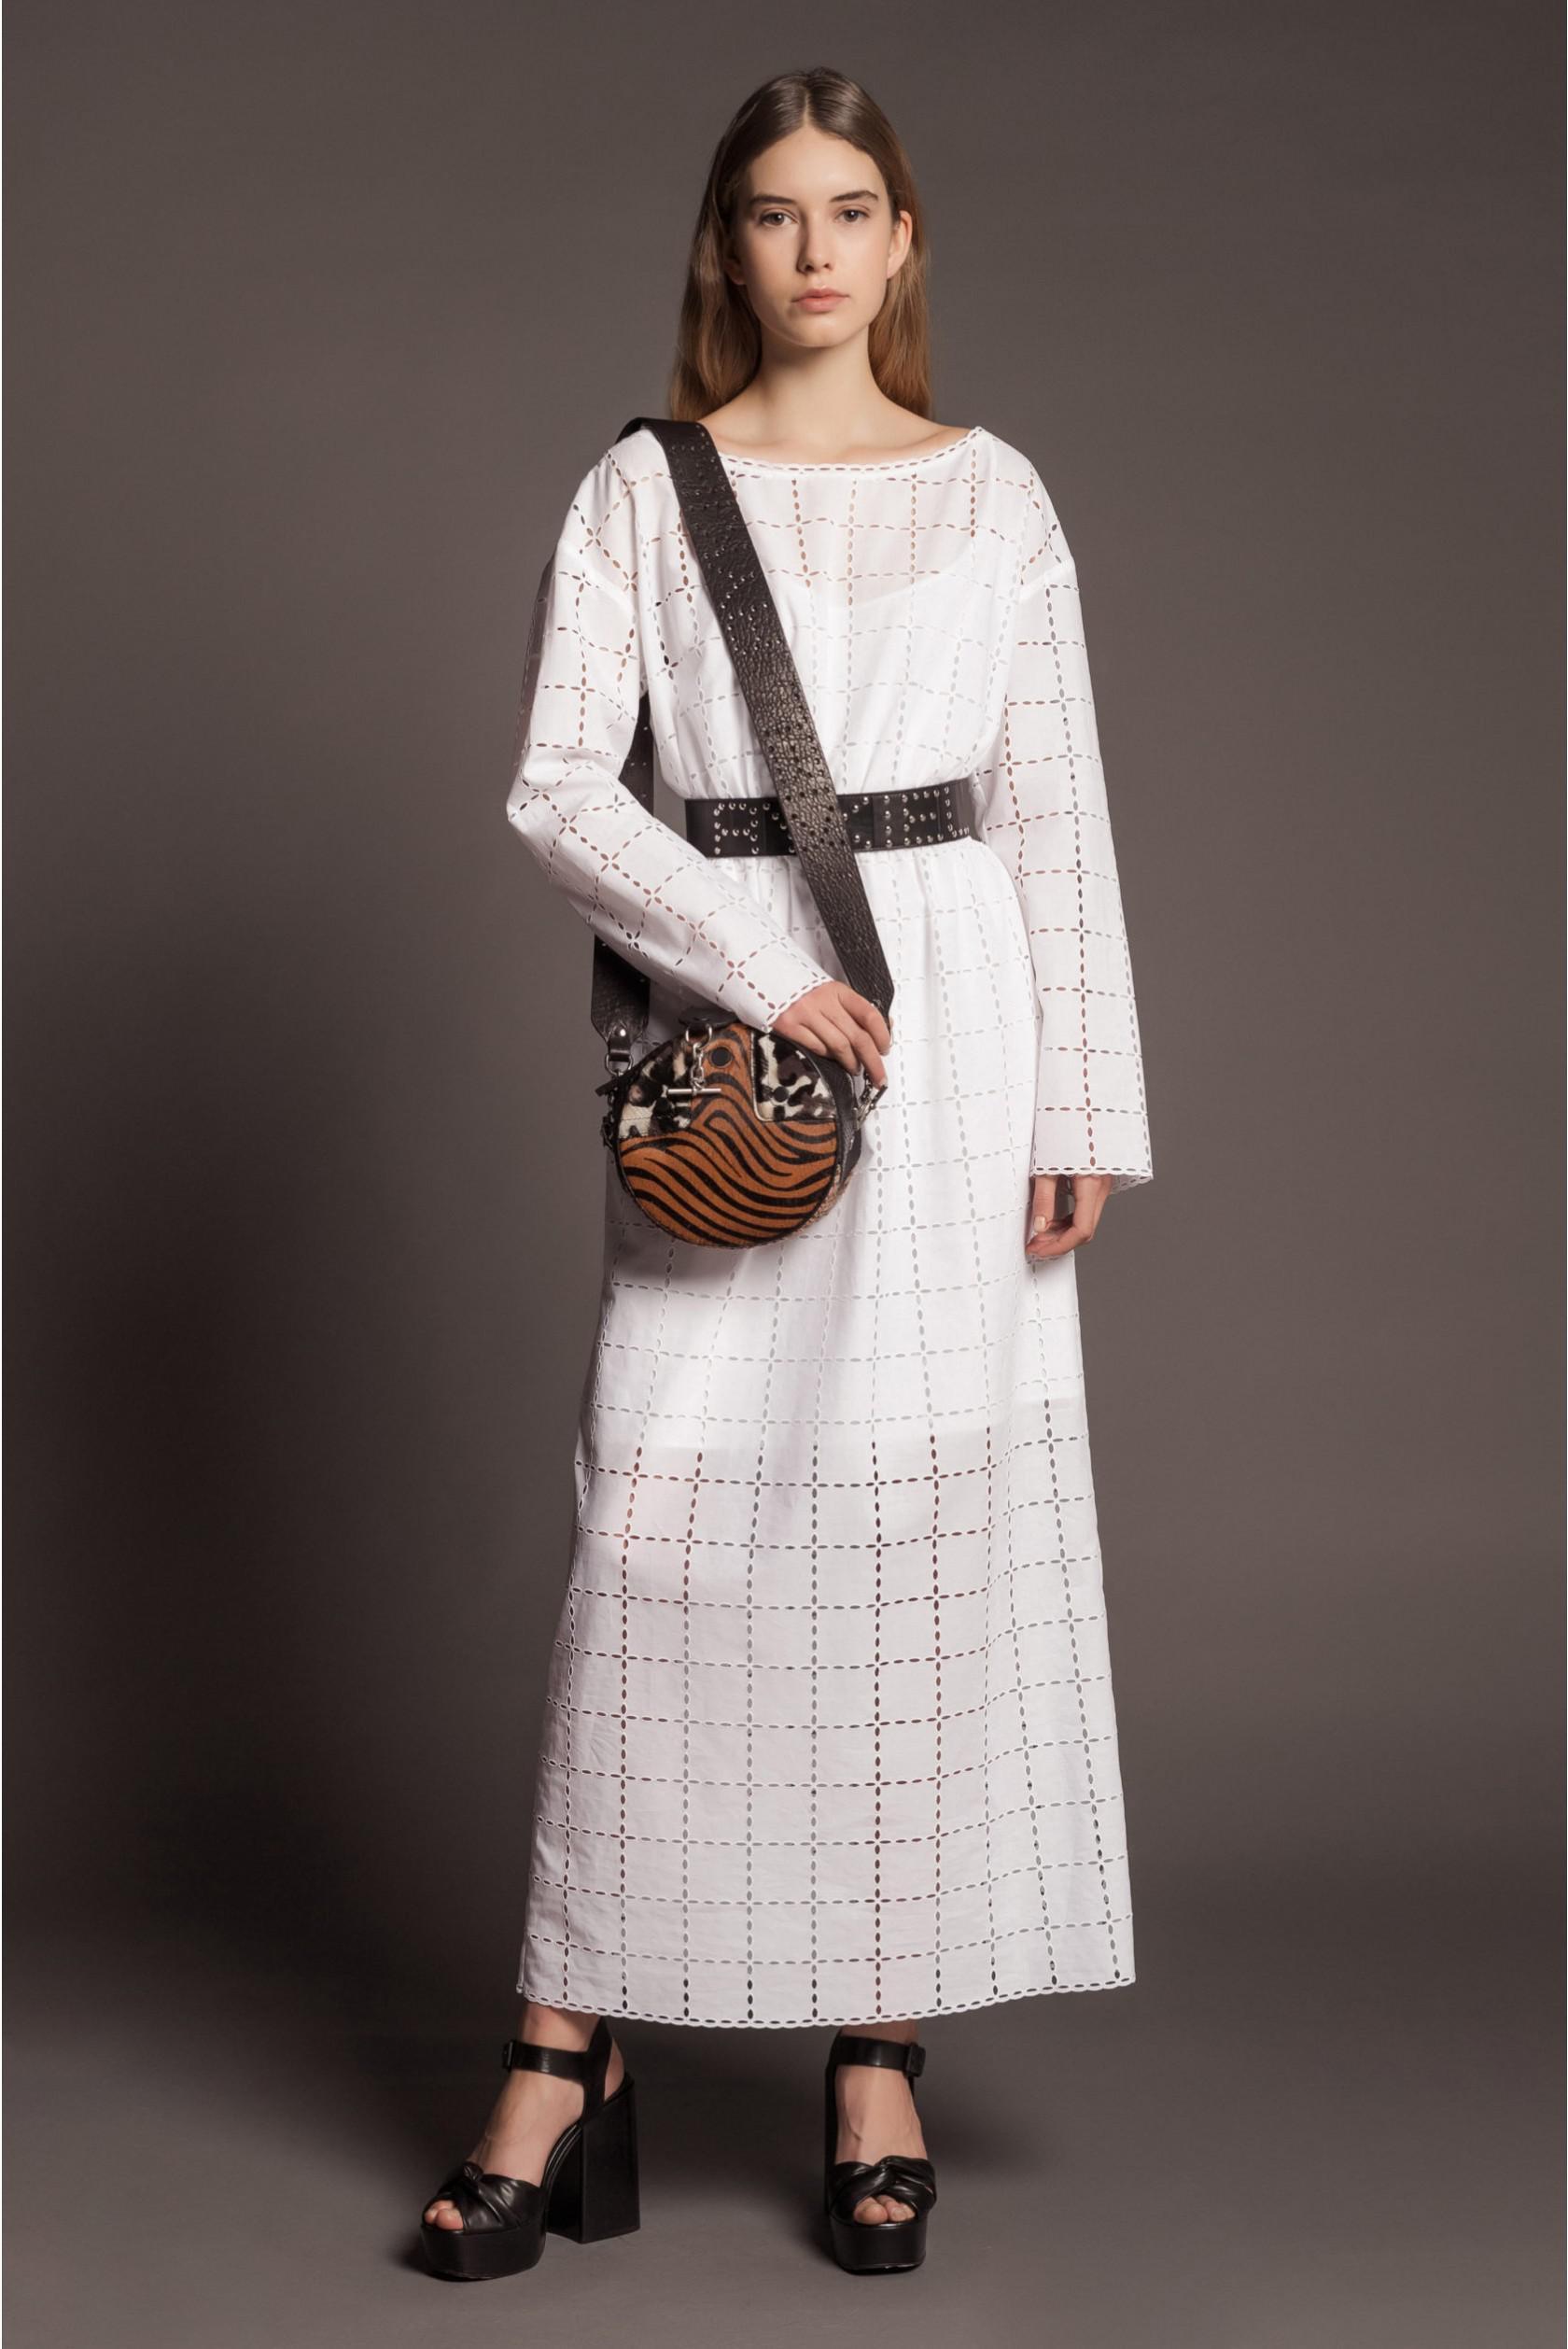 ecceb9aef38 Lyst - Sonia Rykiel Long Broderie Anglaise Dress